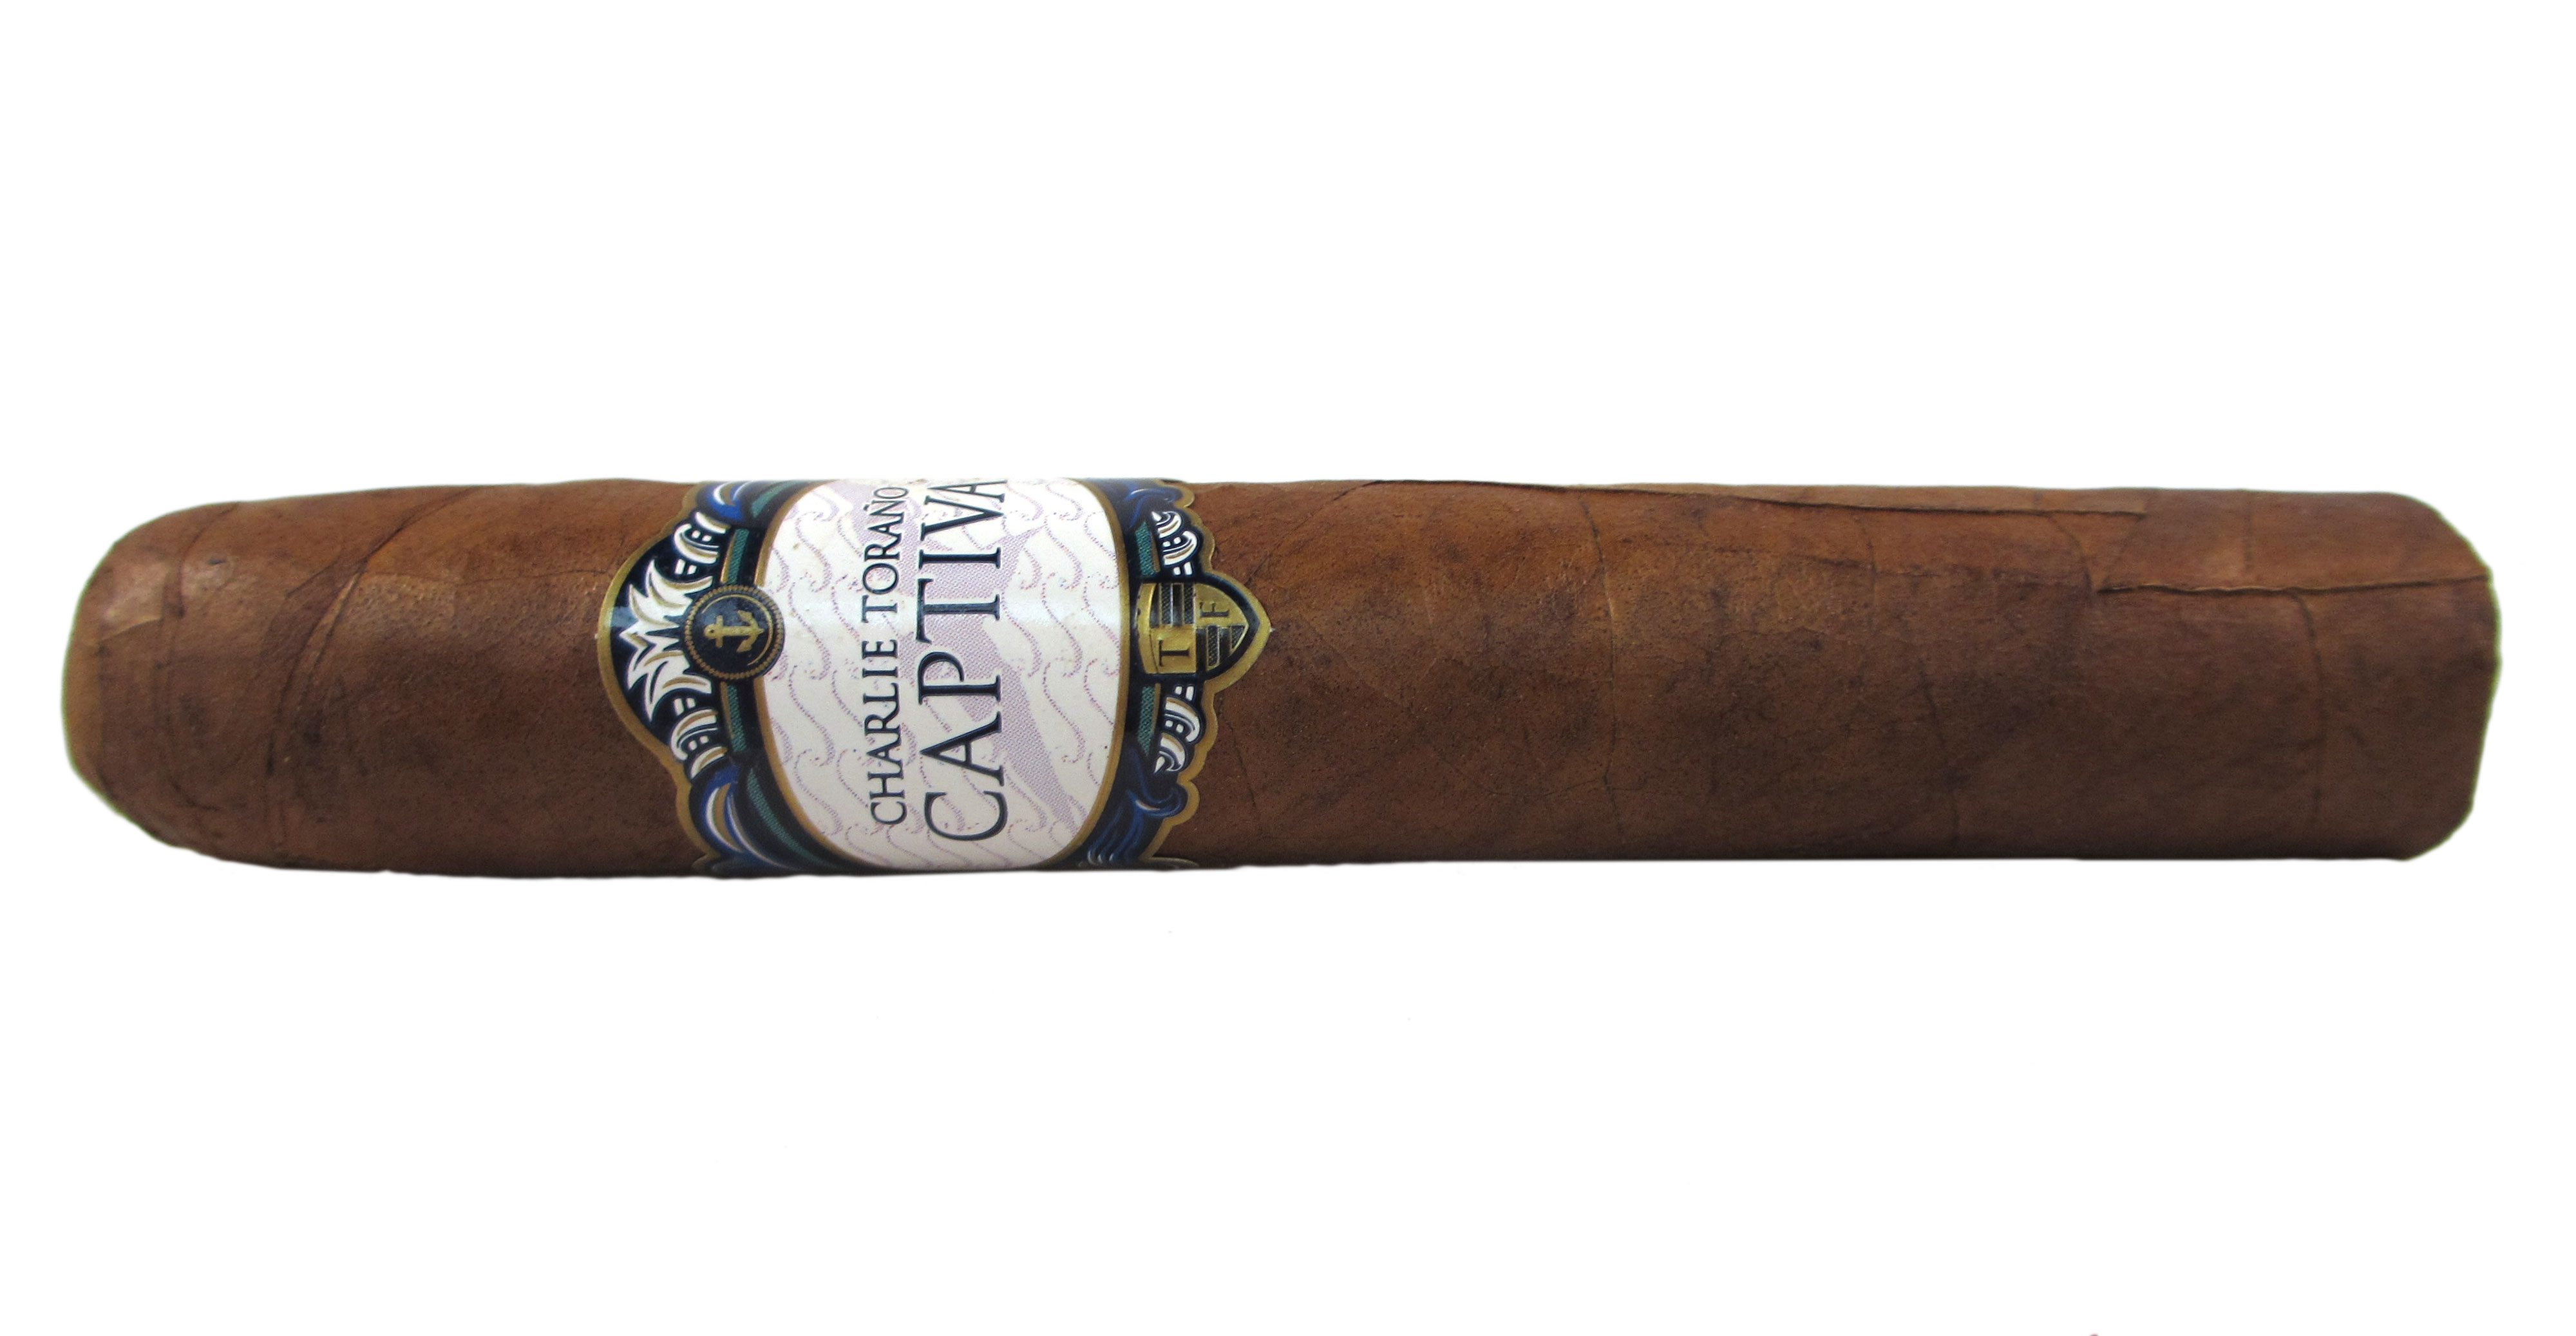 Blind Cigar Review: Charlie Toraño | Captiva Robusto